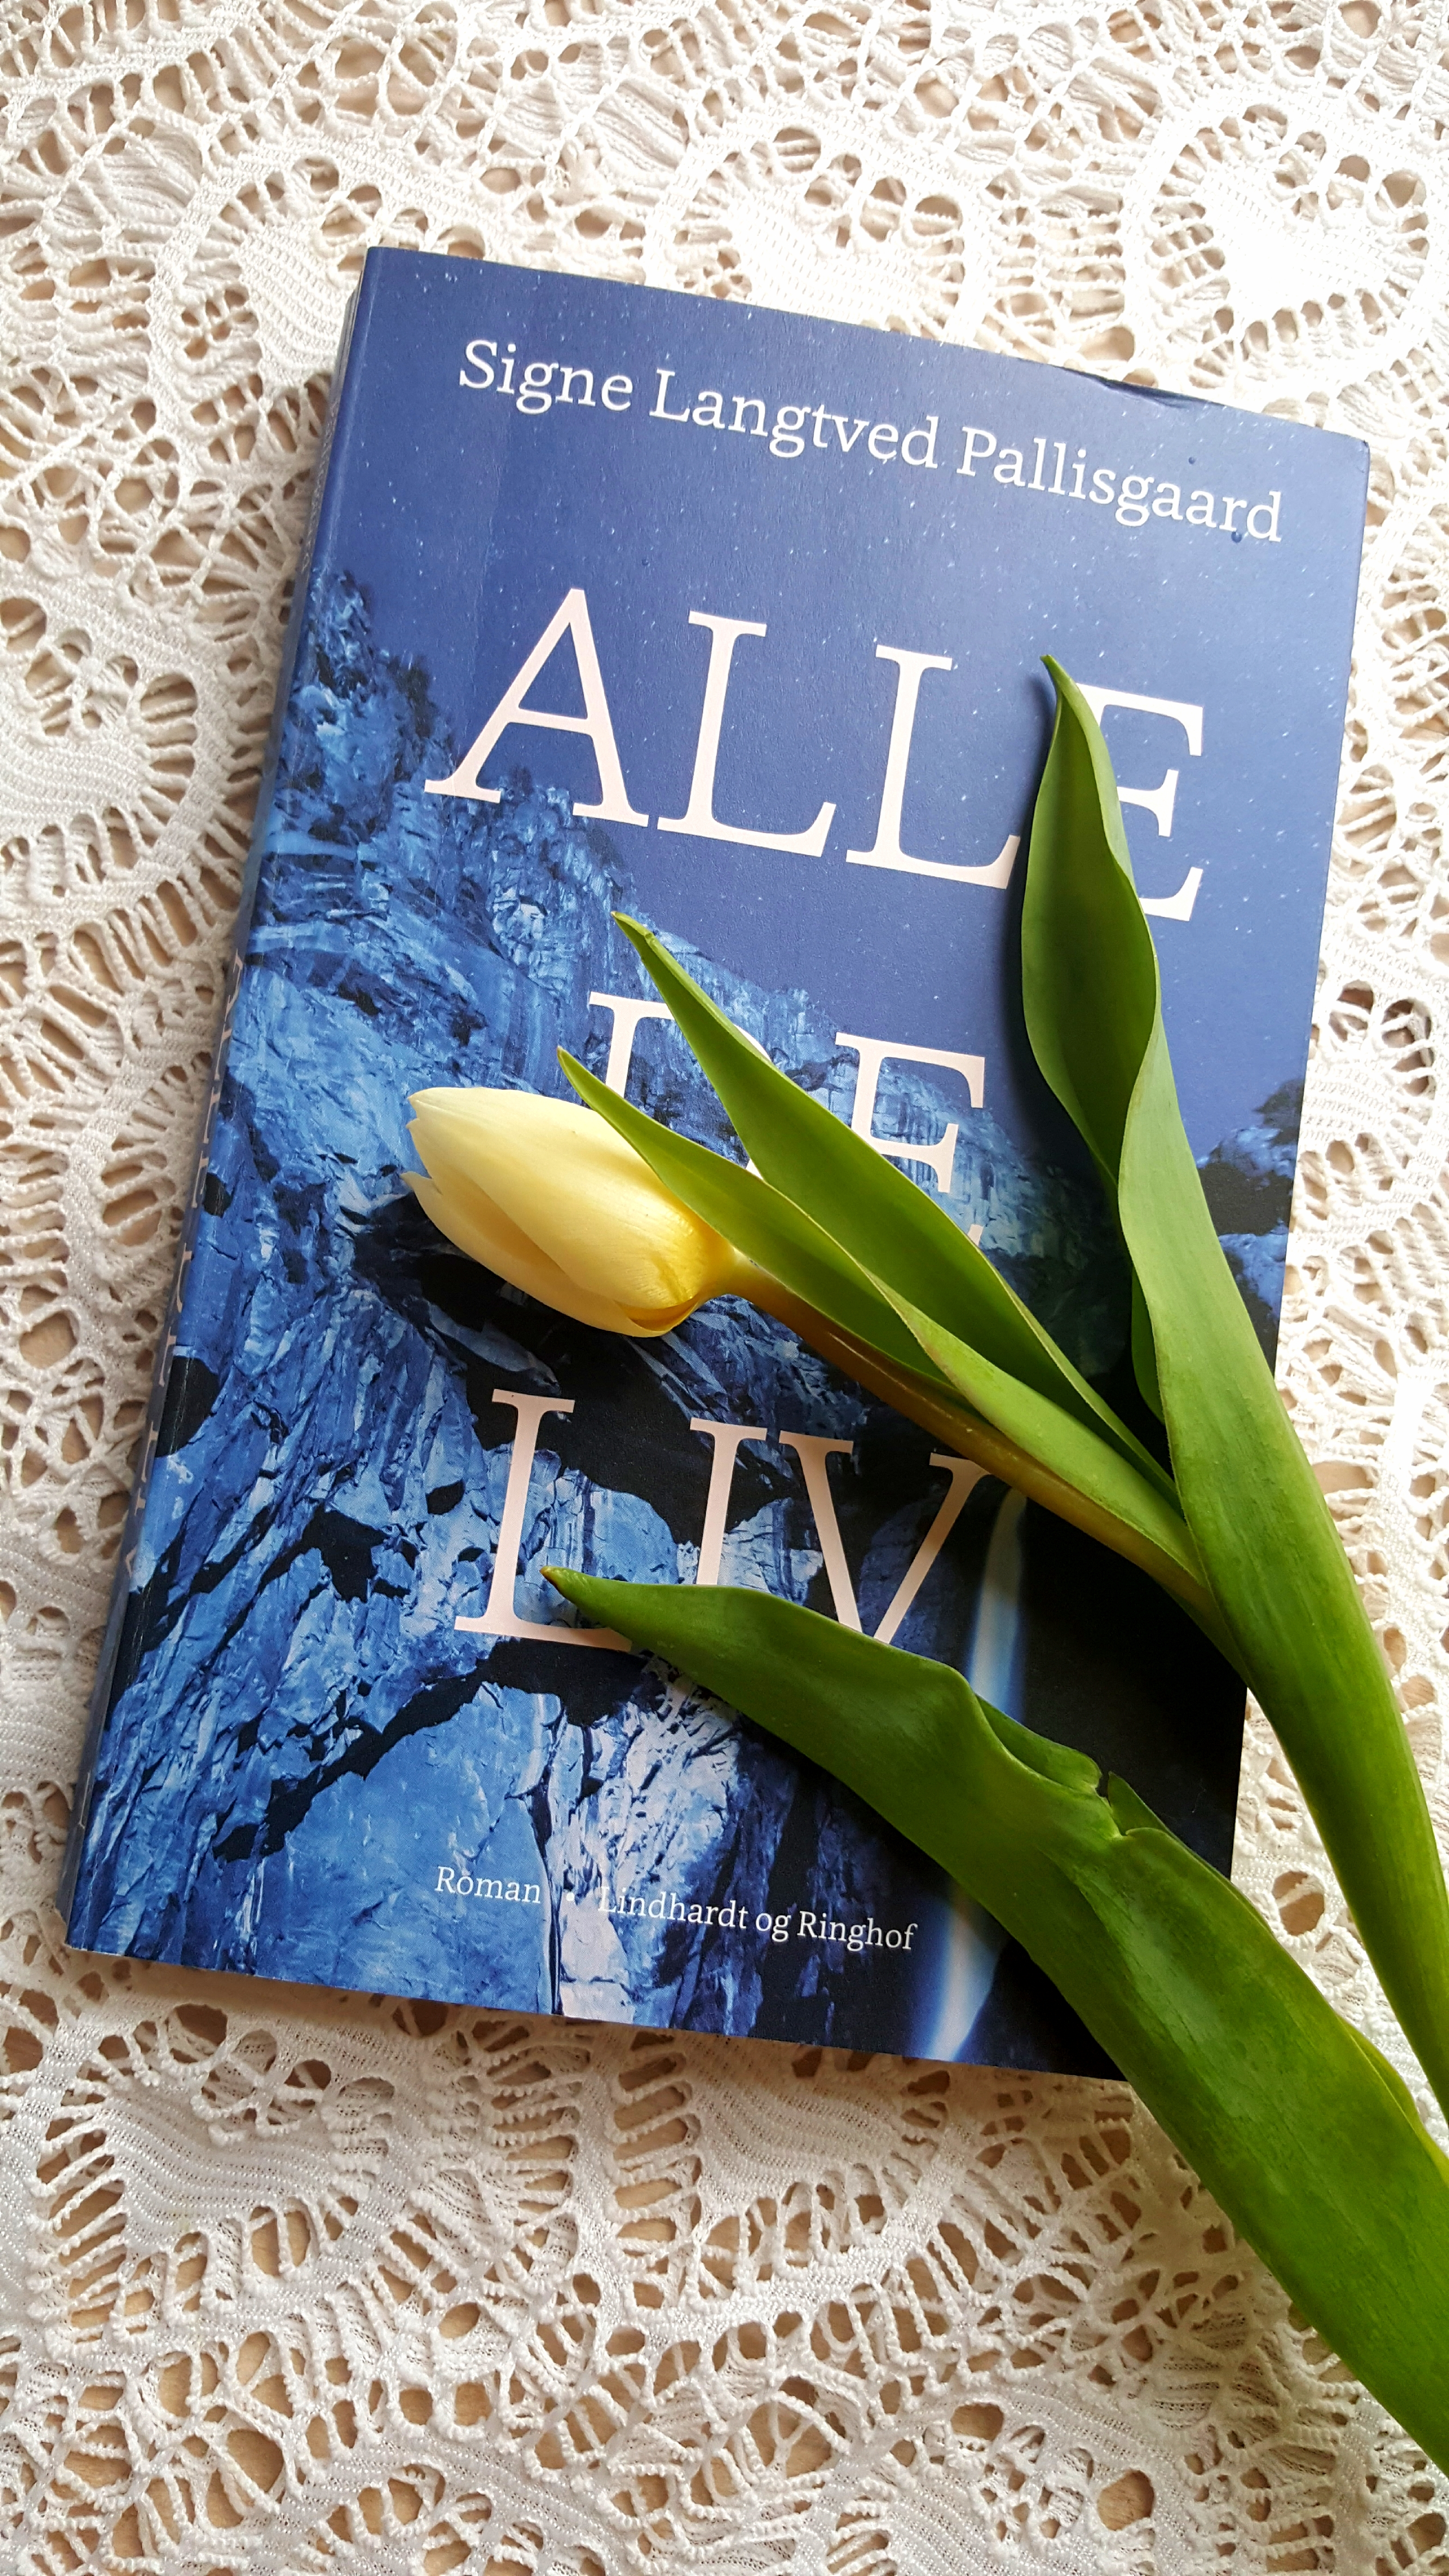 Alle de liv af Signe L. Pallisgaard